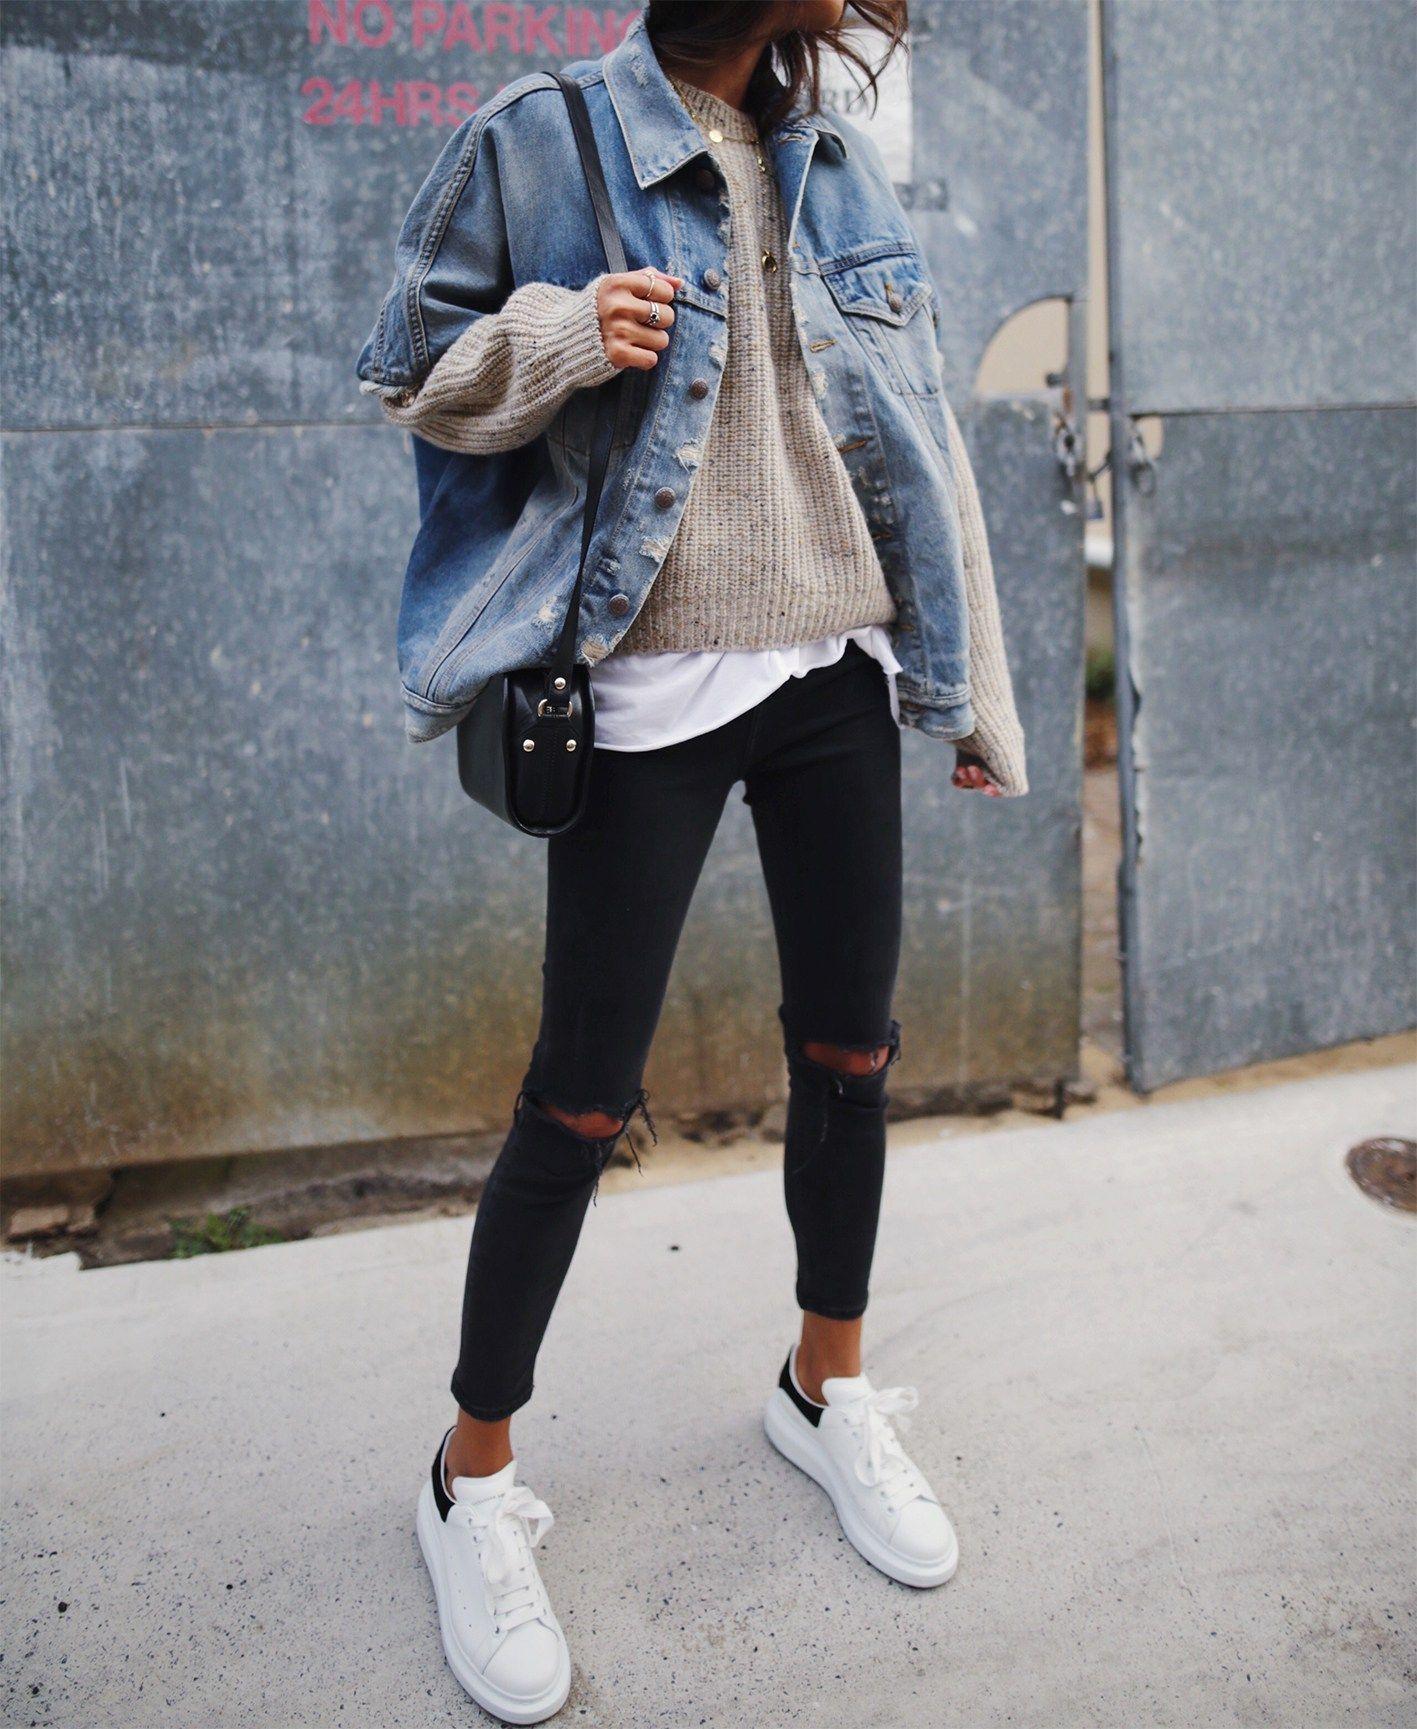 95f494e1b Jean jacket Black jeans White sneakers White shirt Beige shirt ...